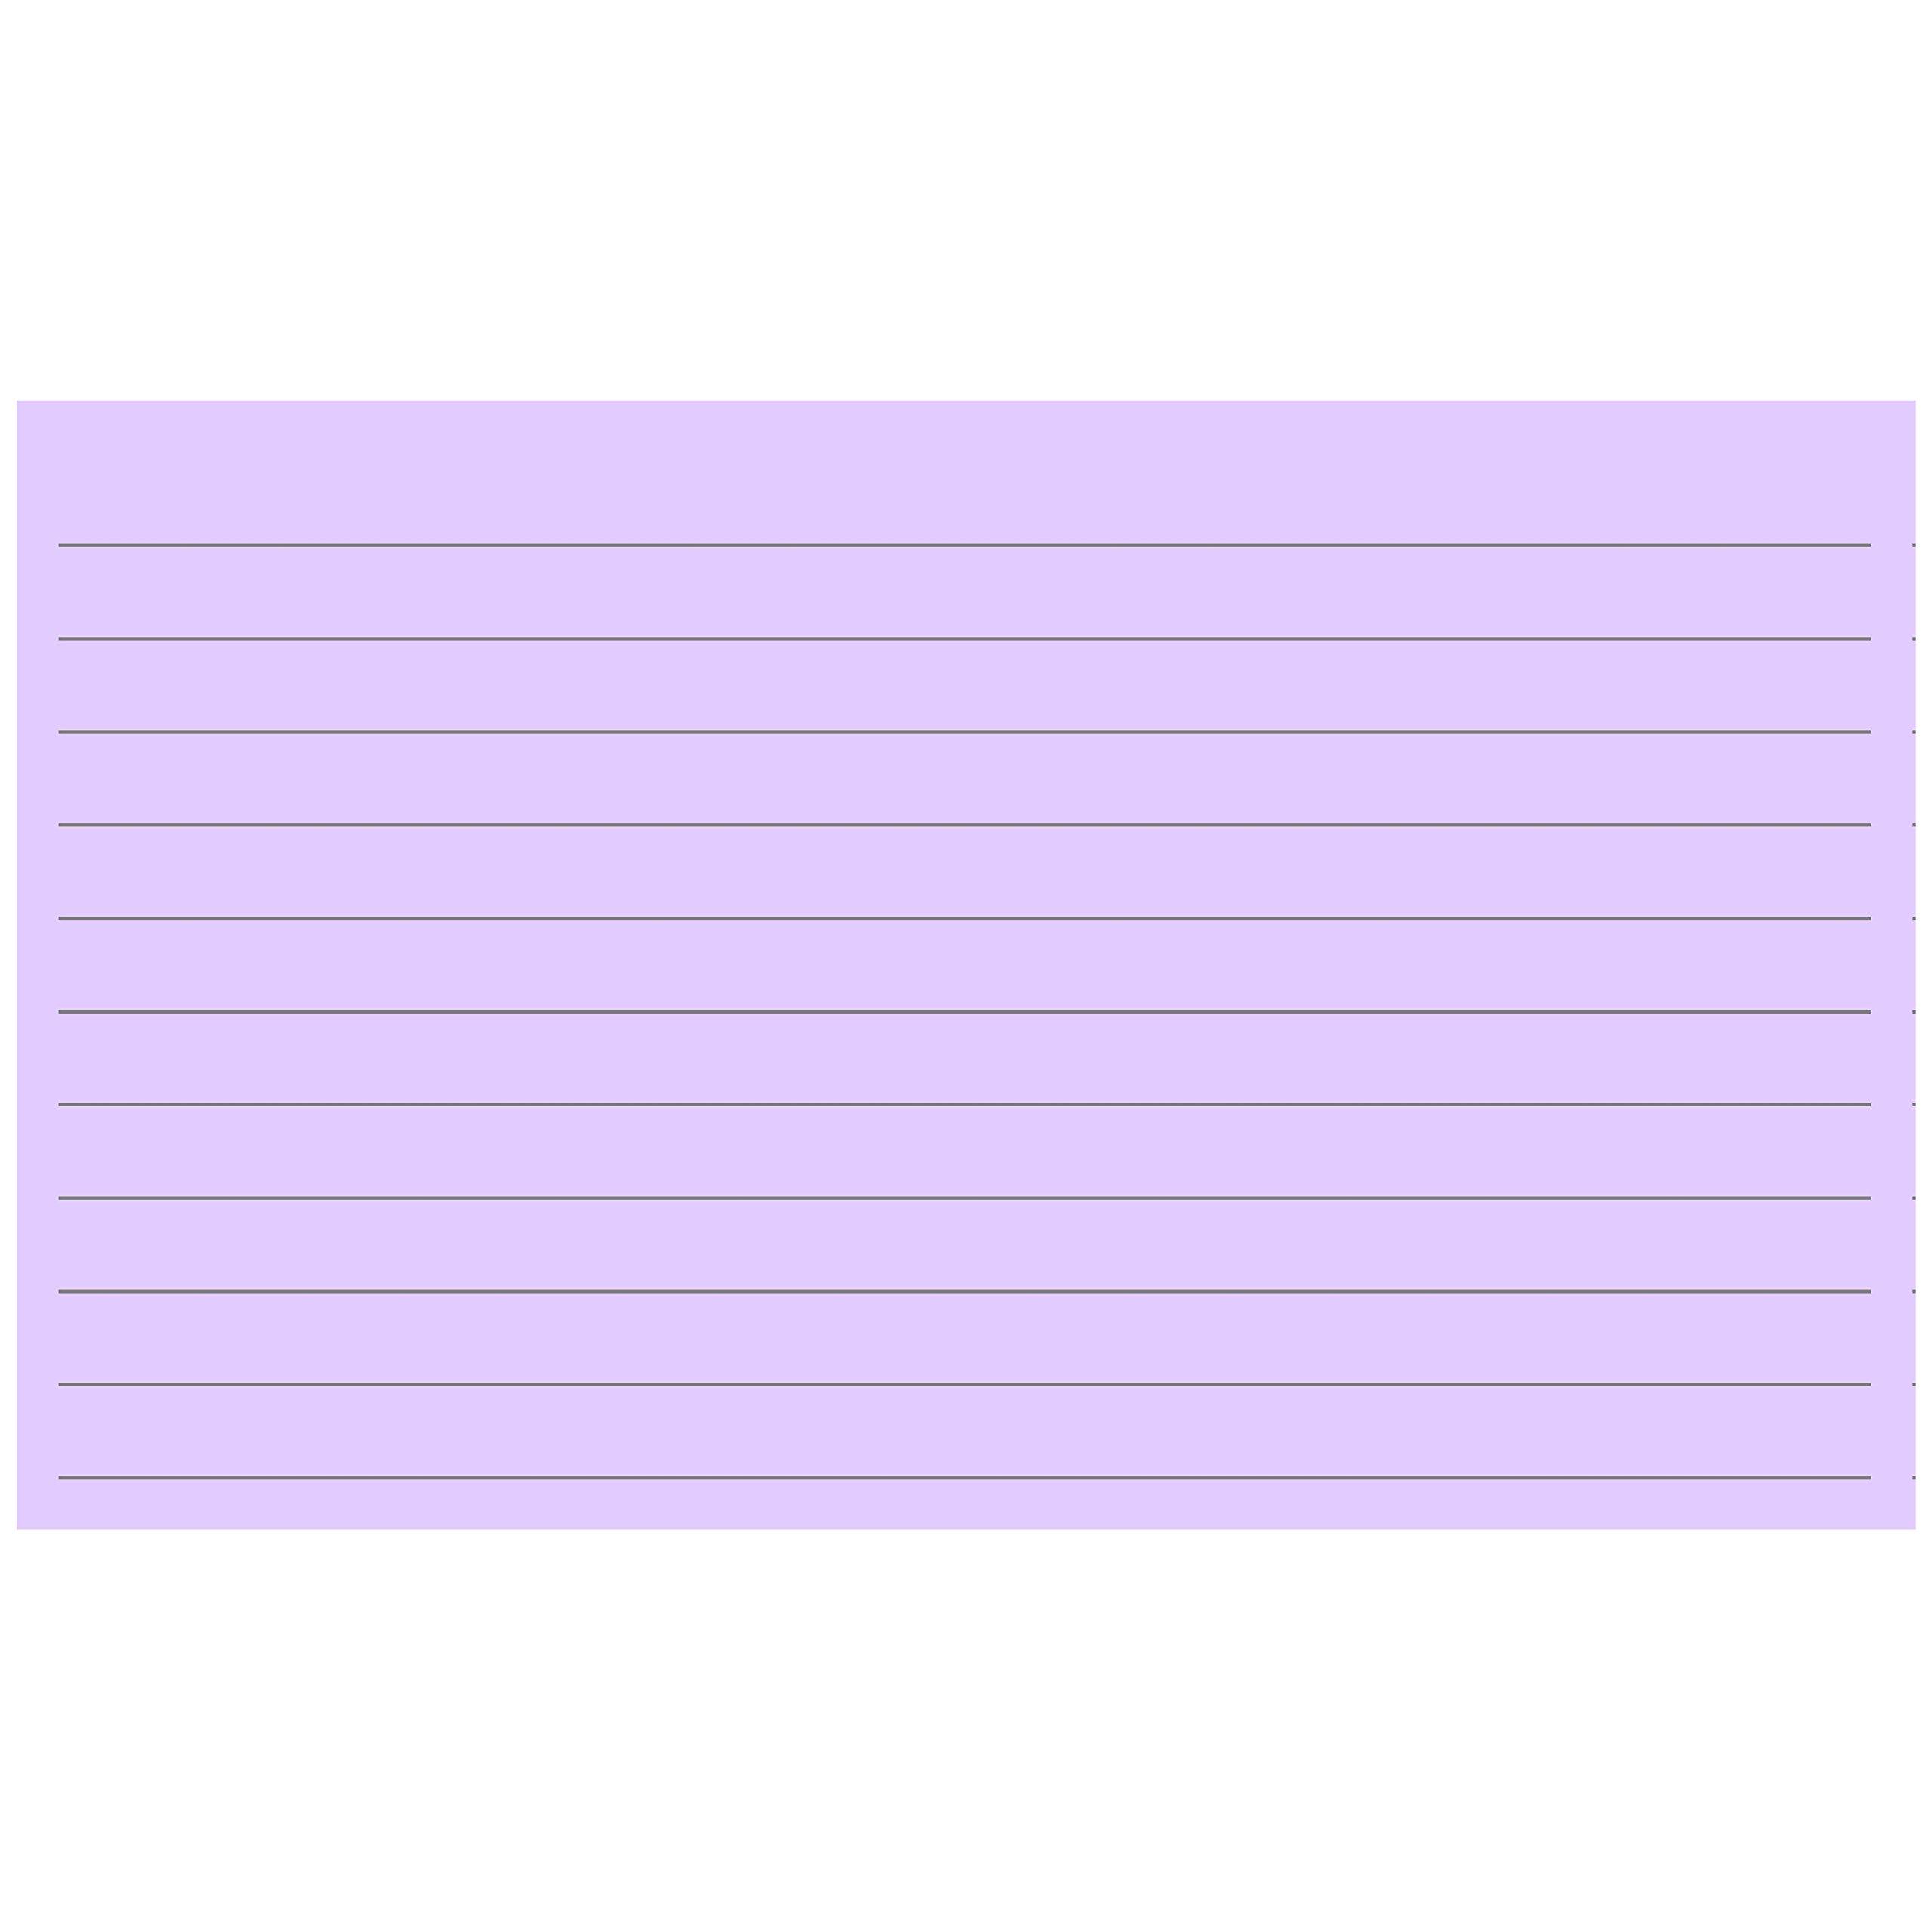 Colonial Cards: 150 Color Cardstock 3'' x 5'' Index Cards, Light Purple, Lined Landscape Format